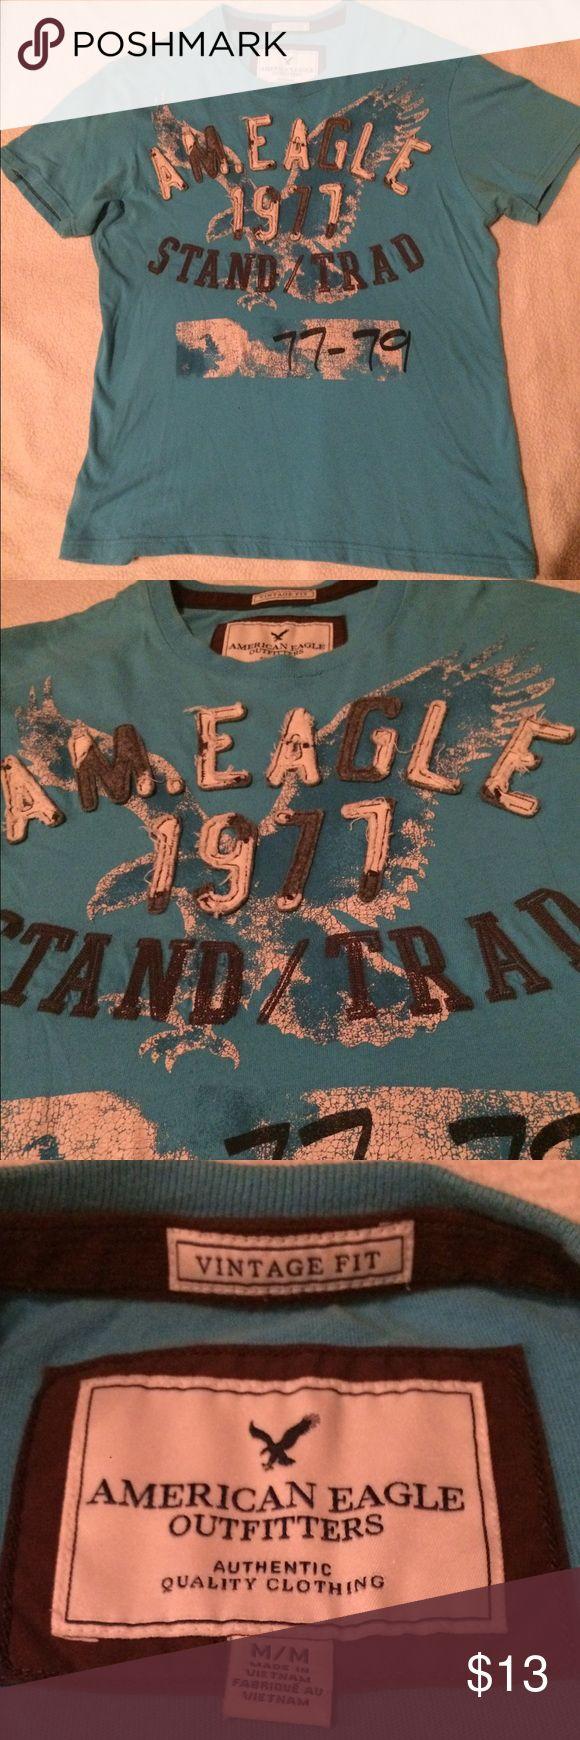 Like new! Boys American Eagle shirt. Like new condition! Boys American Eagle shirt. Very cool! American Eagle Outfitters Shirts & Tops Tees - Short Sleeve